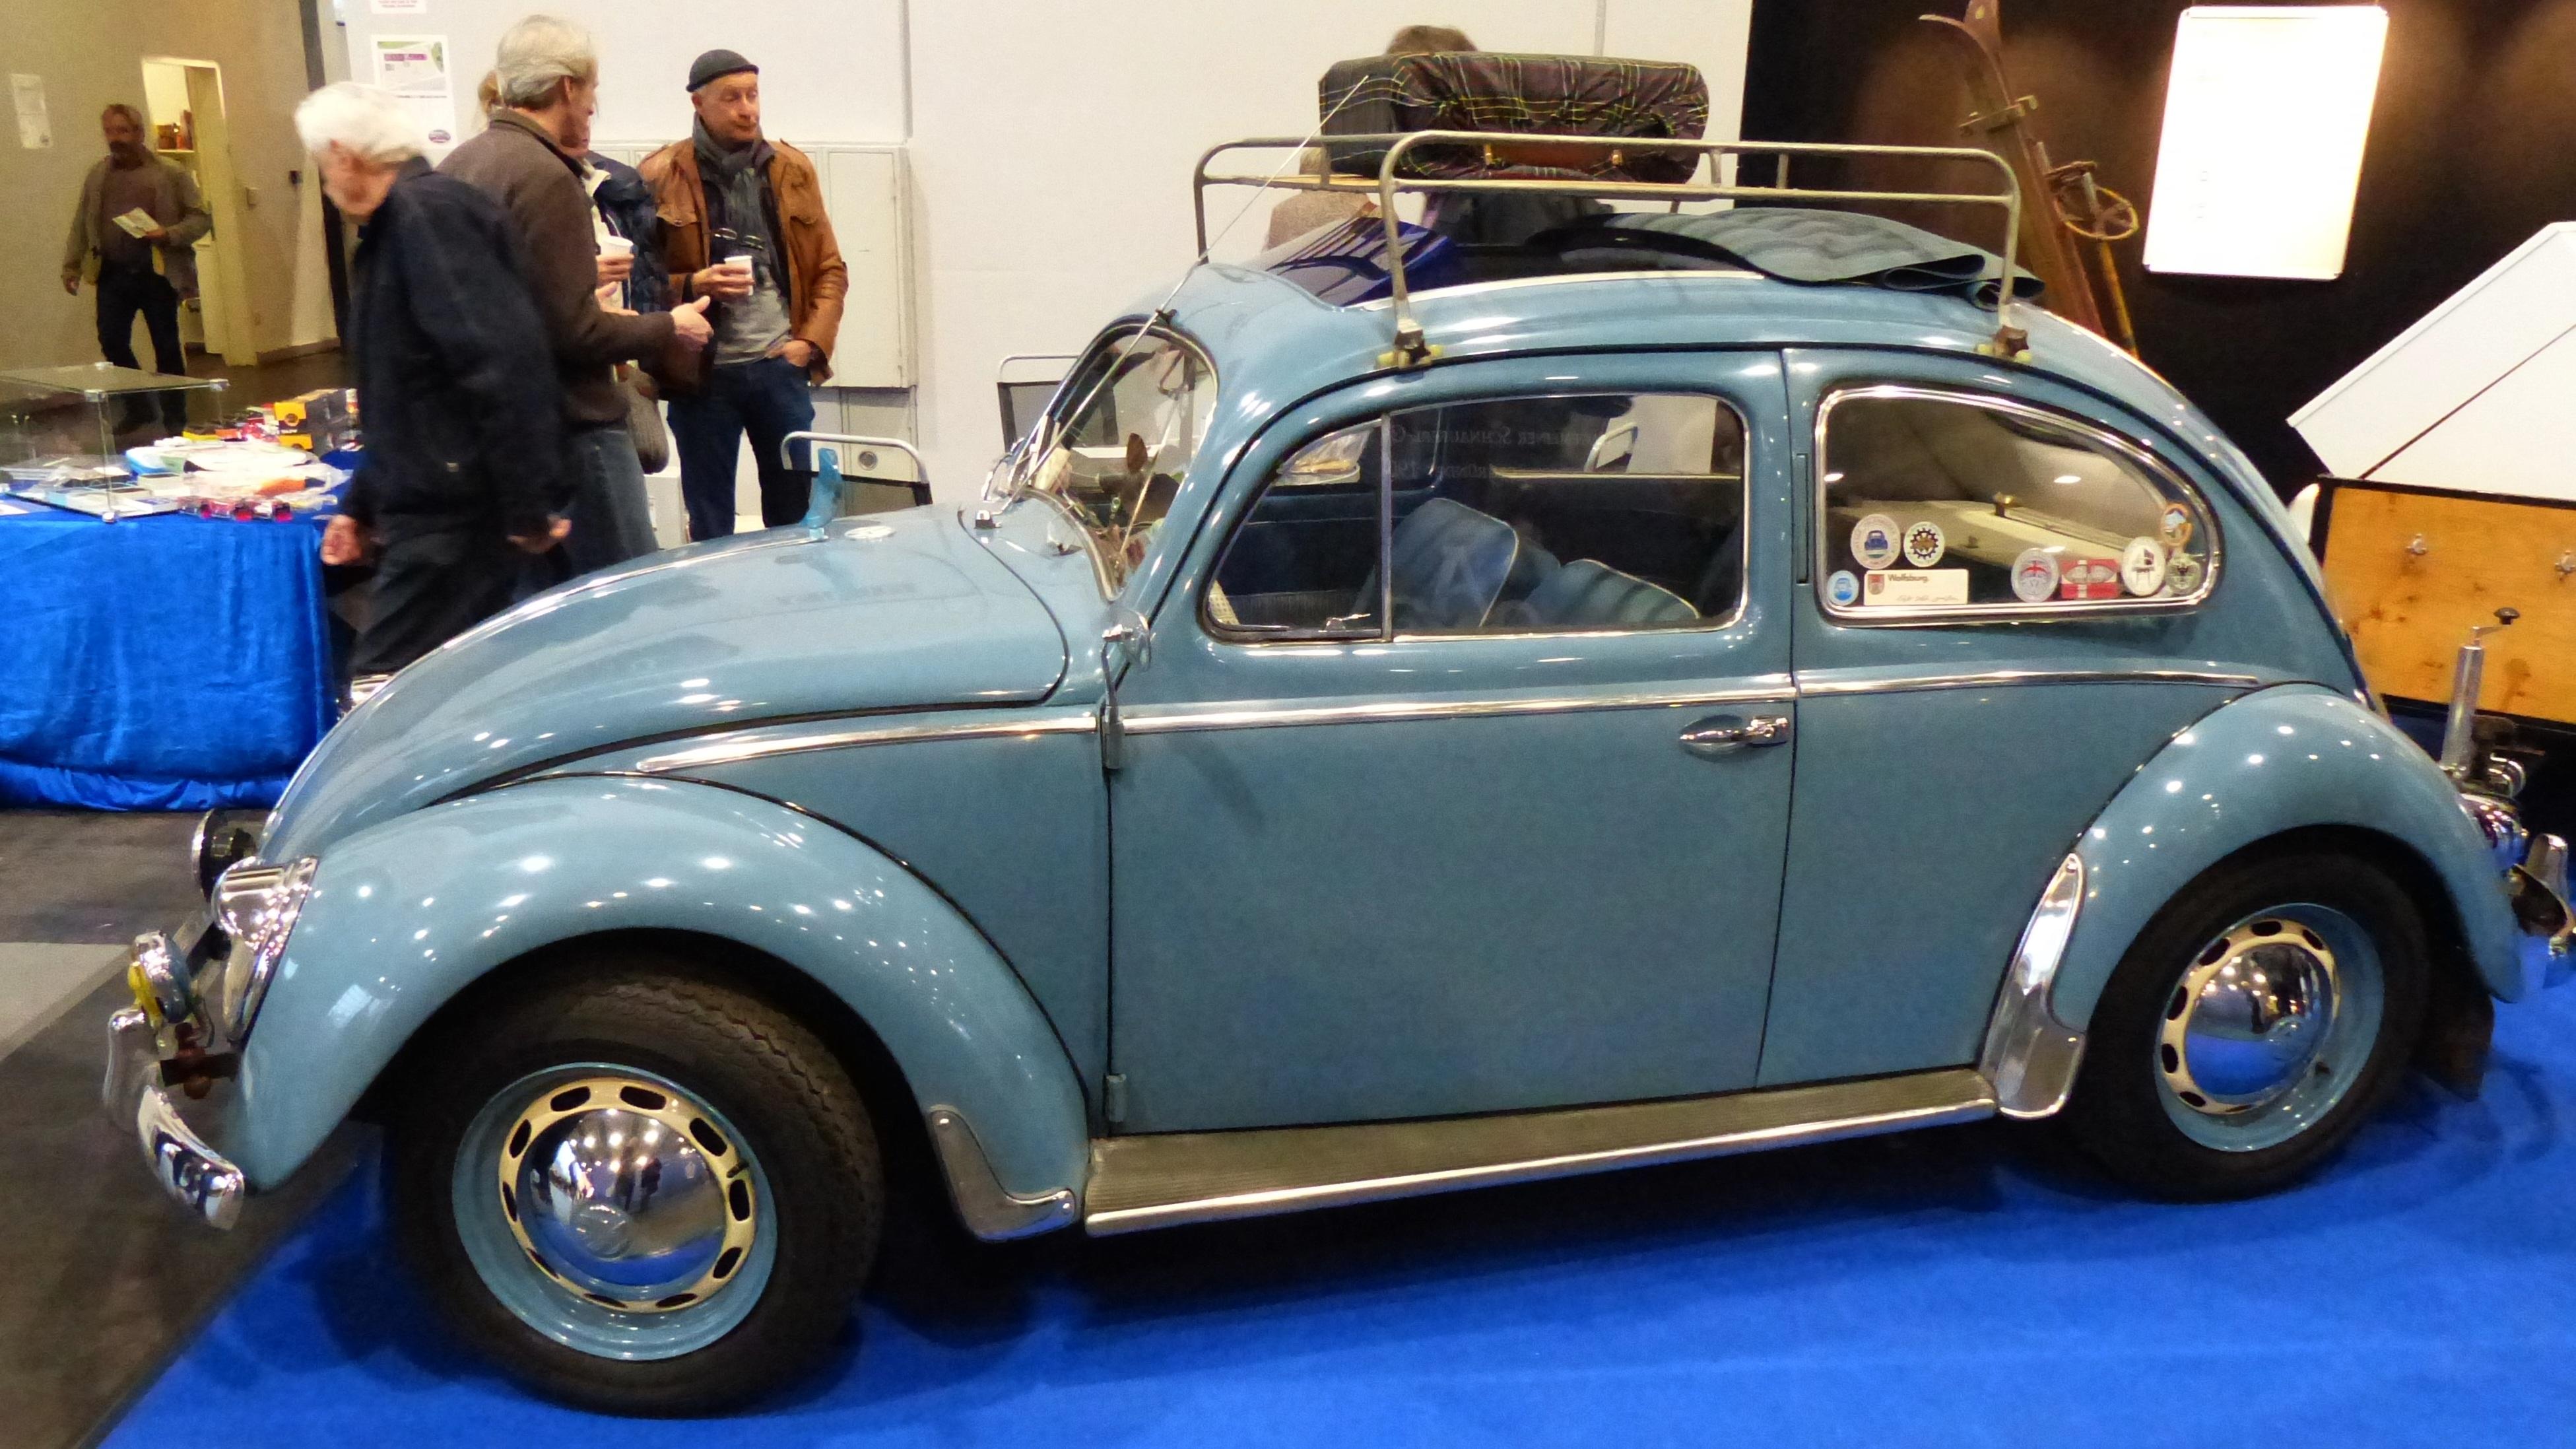 Free Images : auto, motor vehicle, vintage car, vw beetle, oldtimer ...